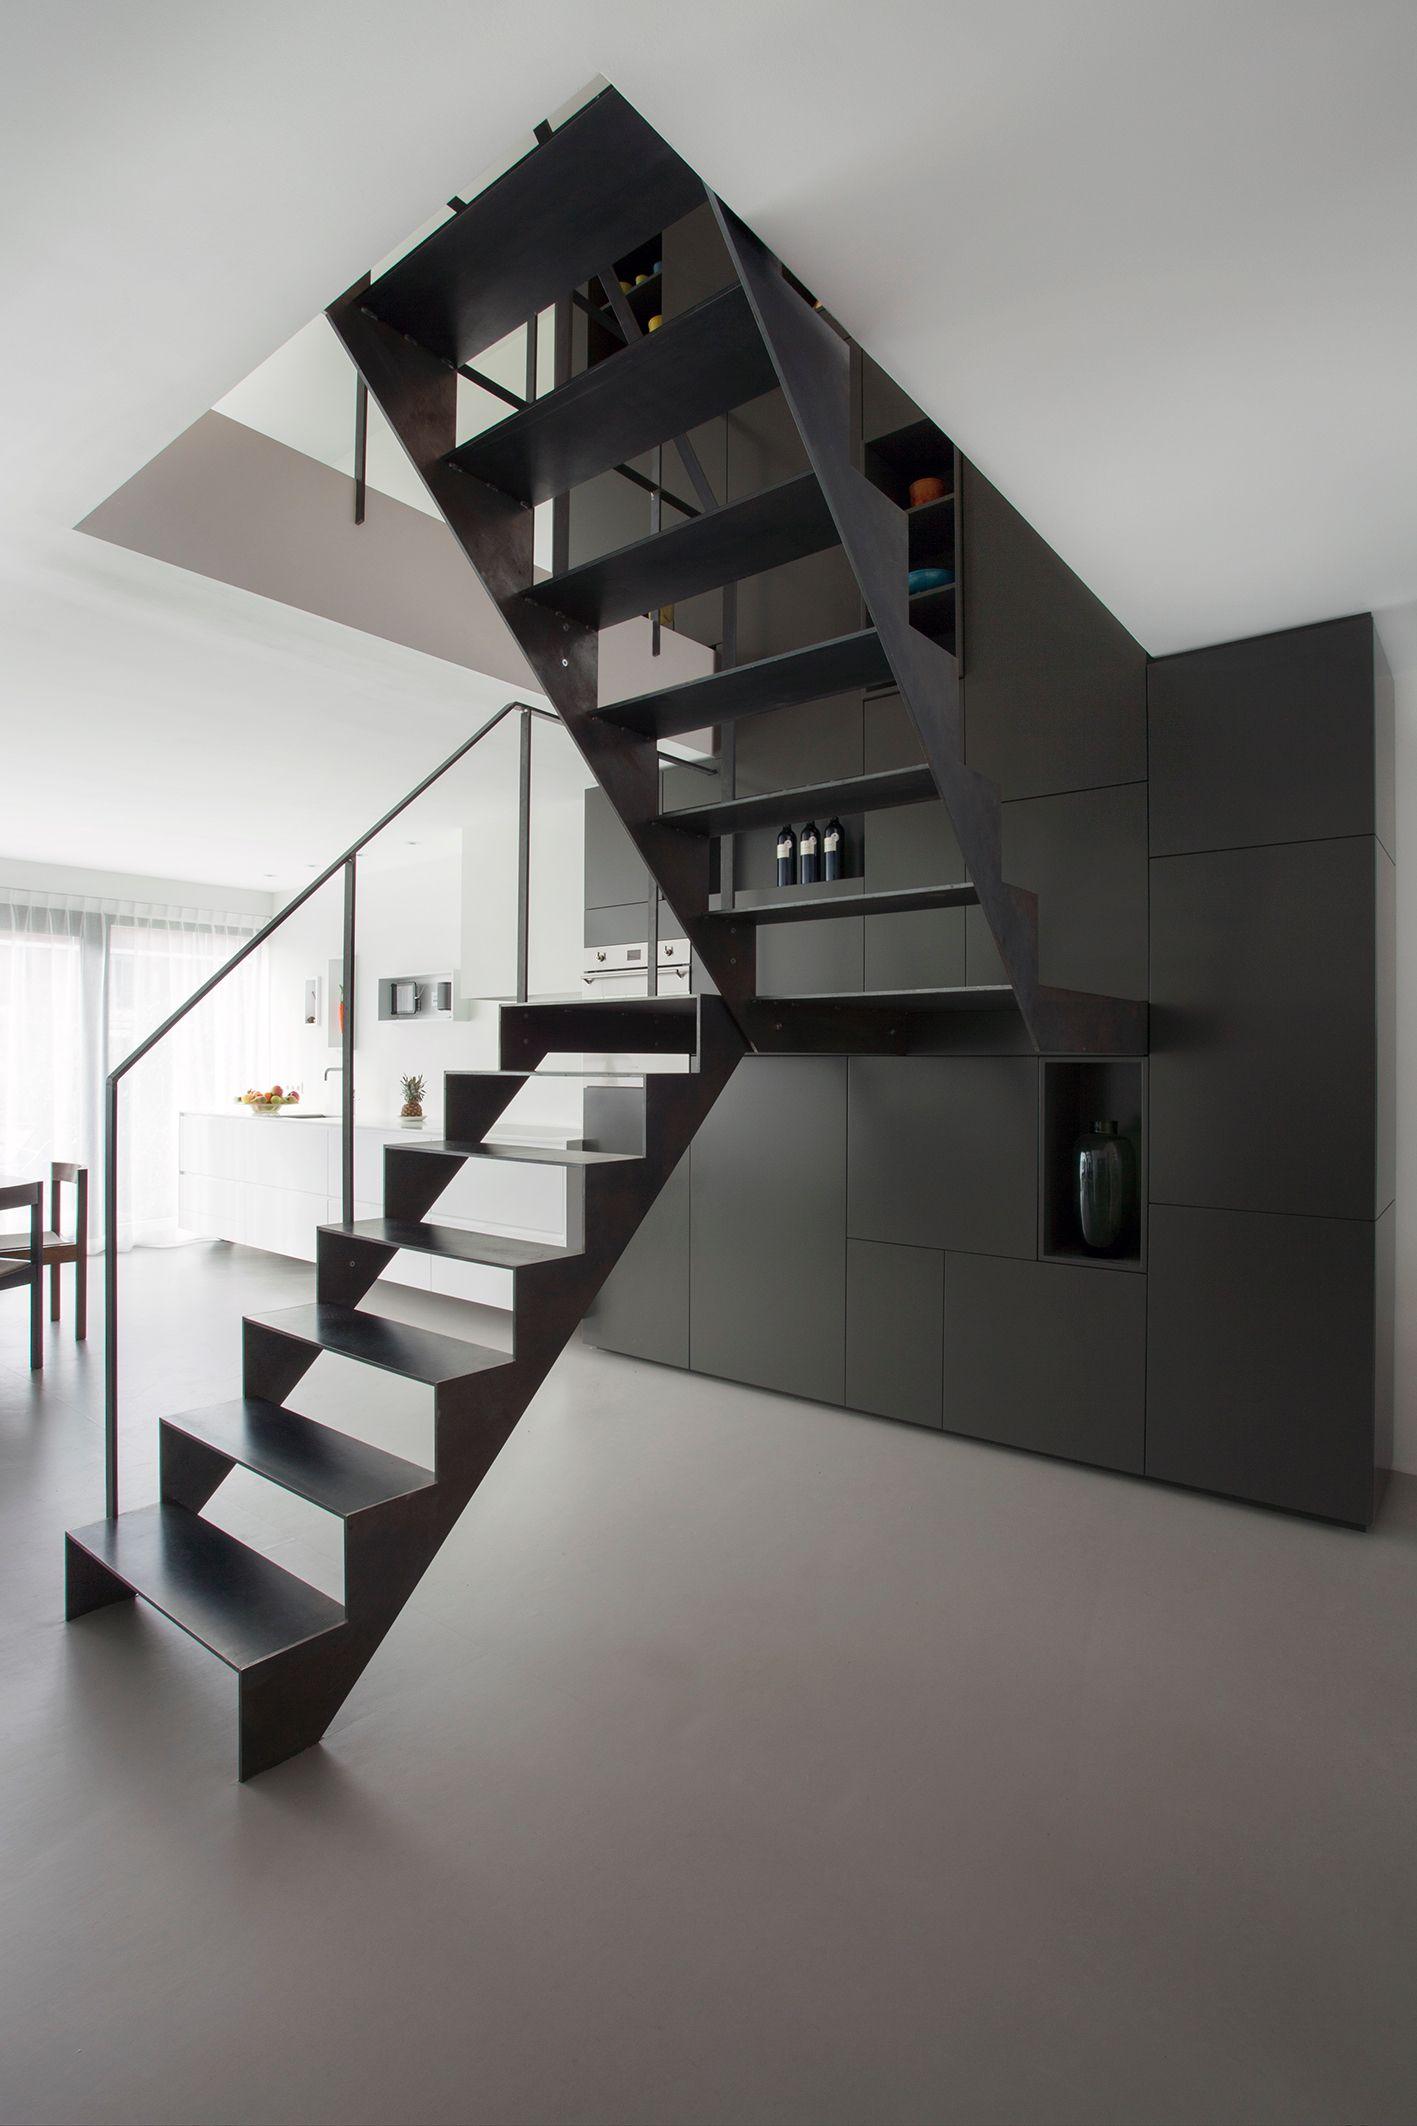 Best 25 Open Staircase Ideas On Pinterest: Geblauwd Stalen Trap